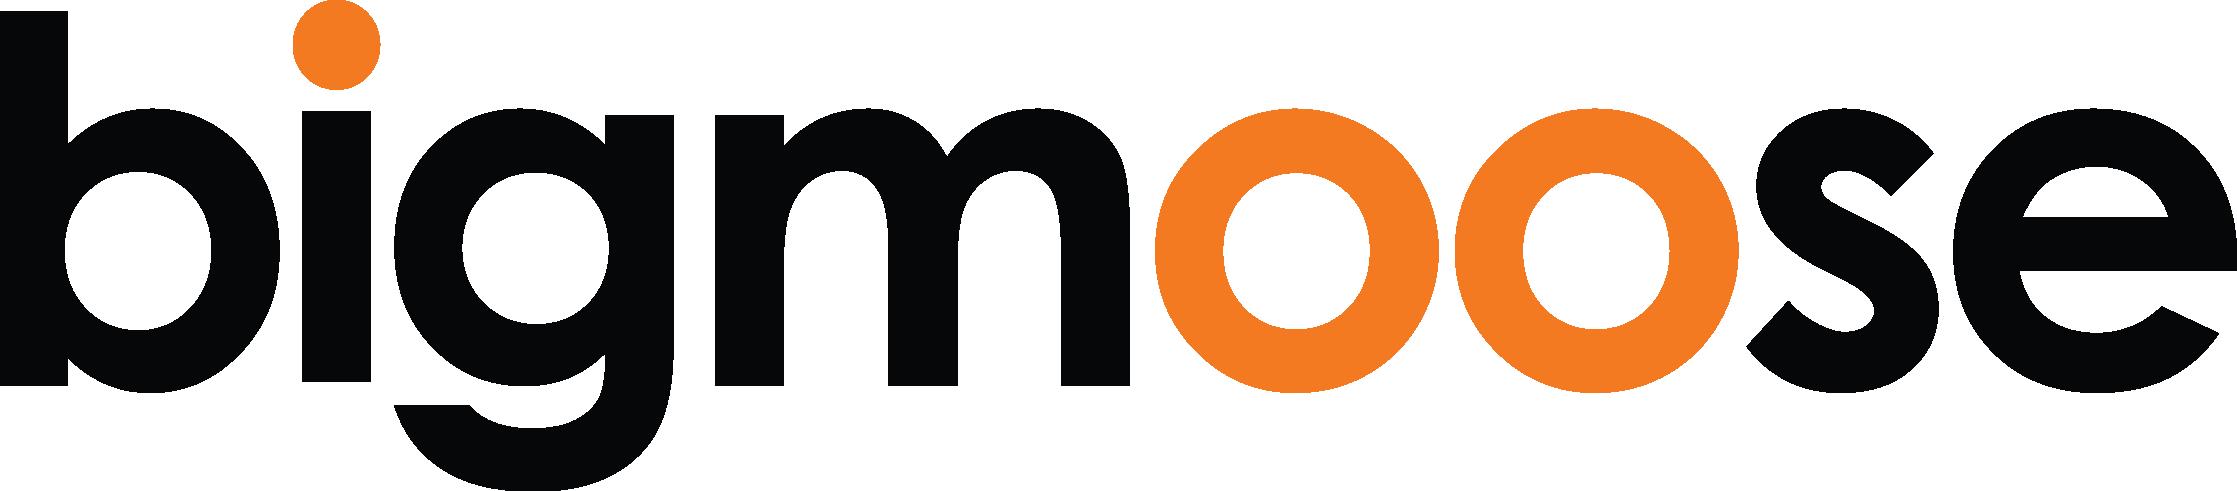 BM_logo_blk.png